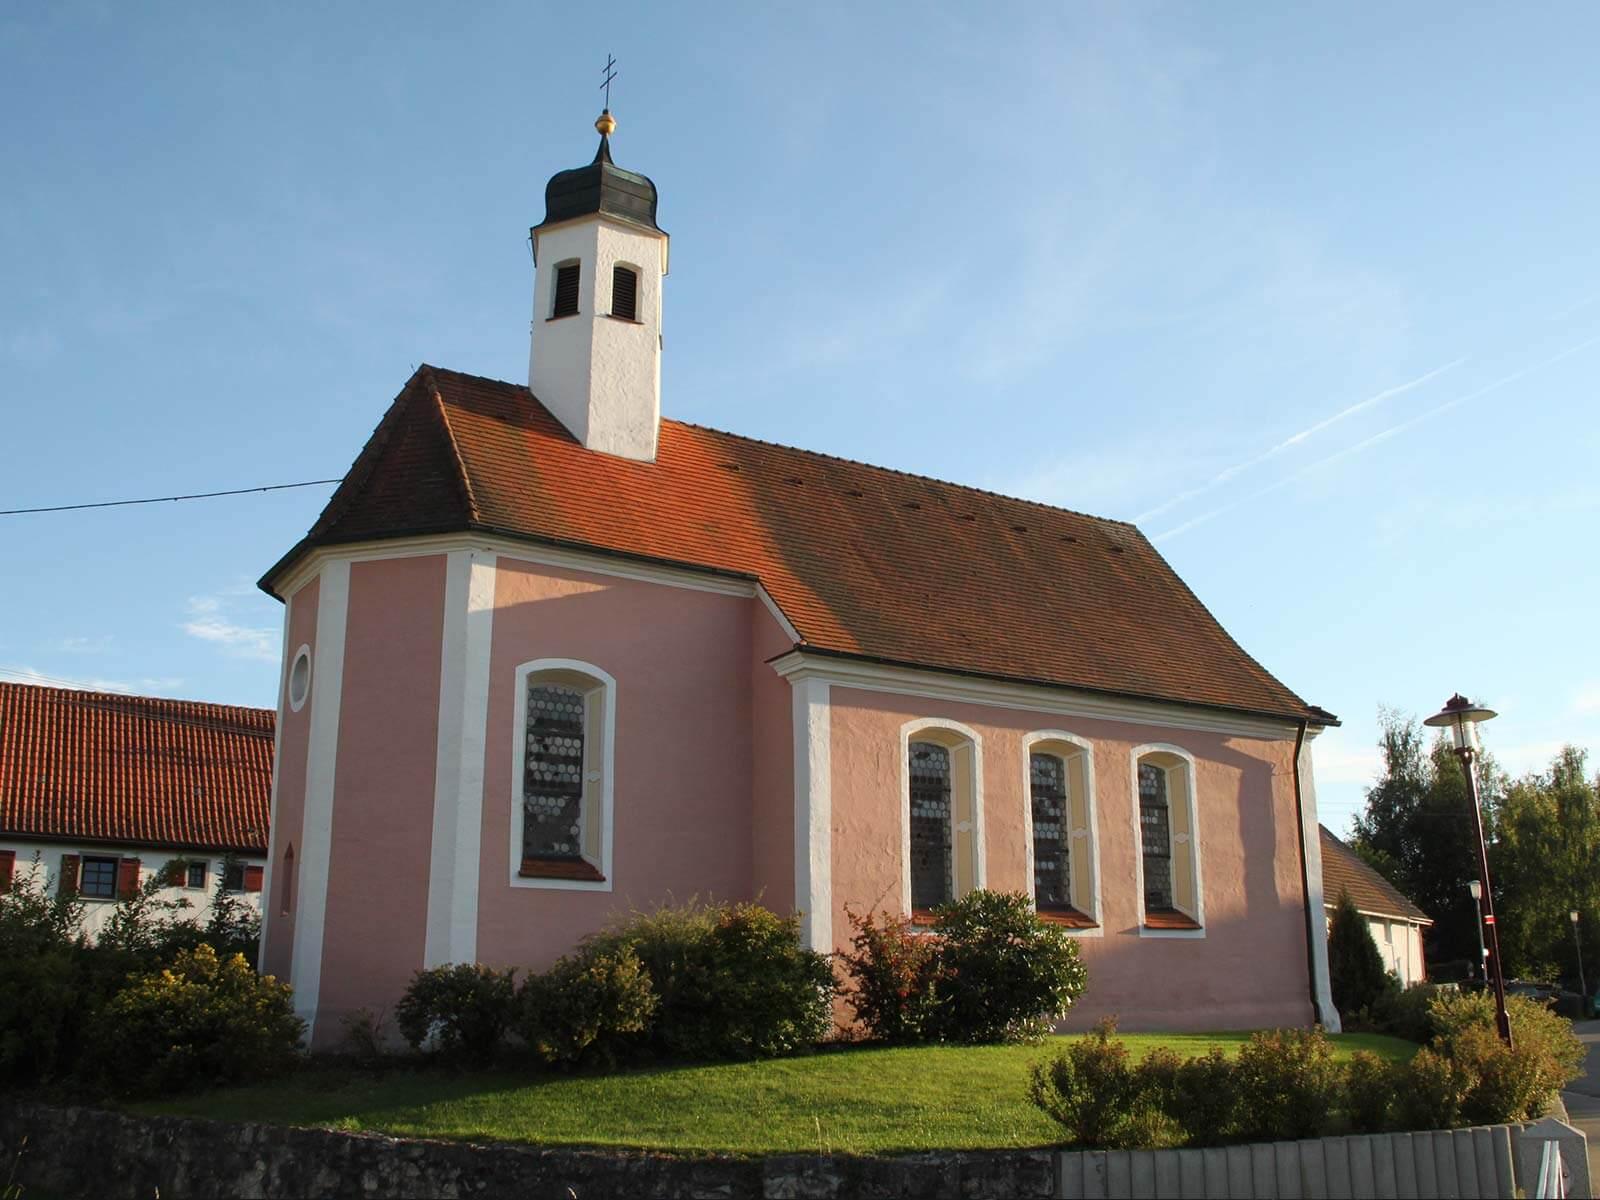 Kirche in Herbertingen